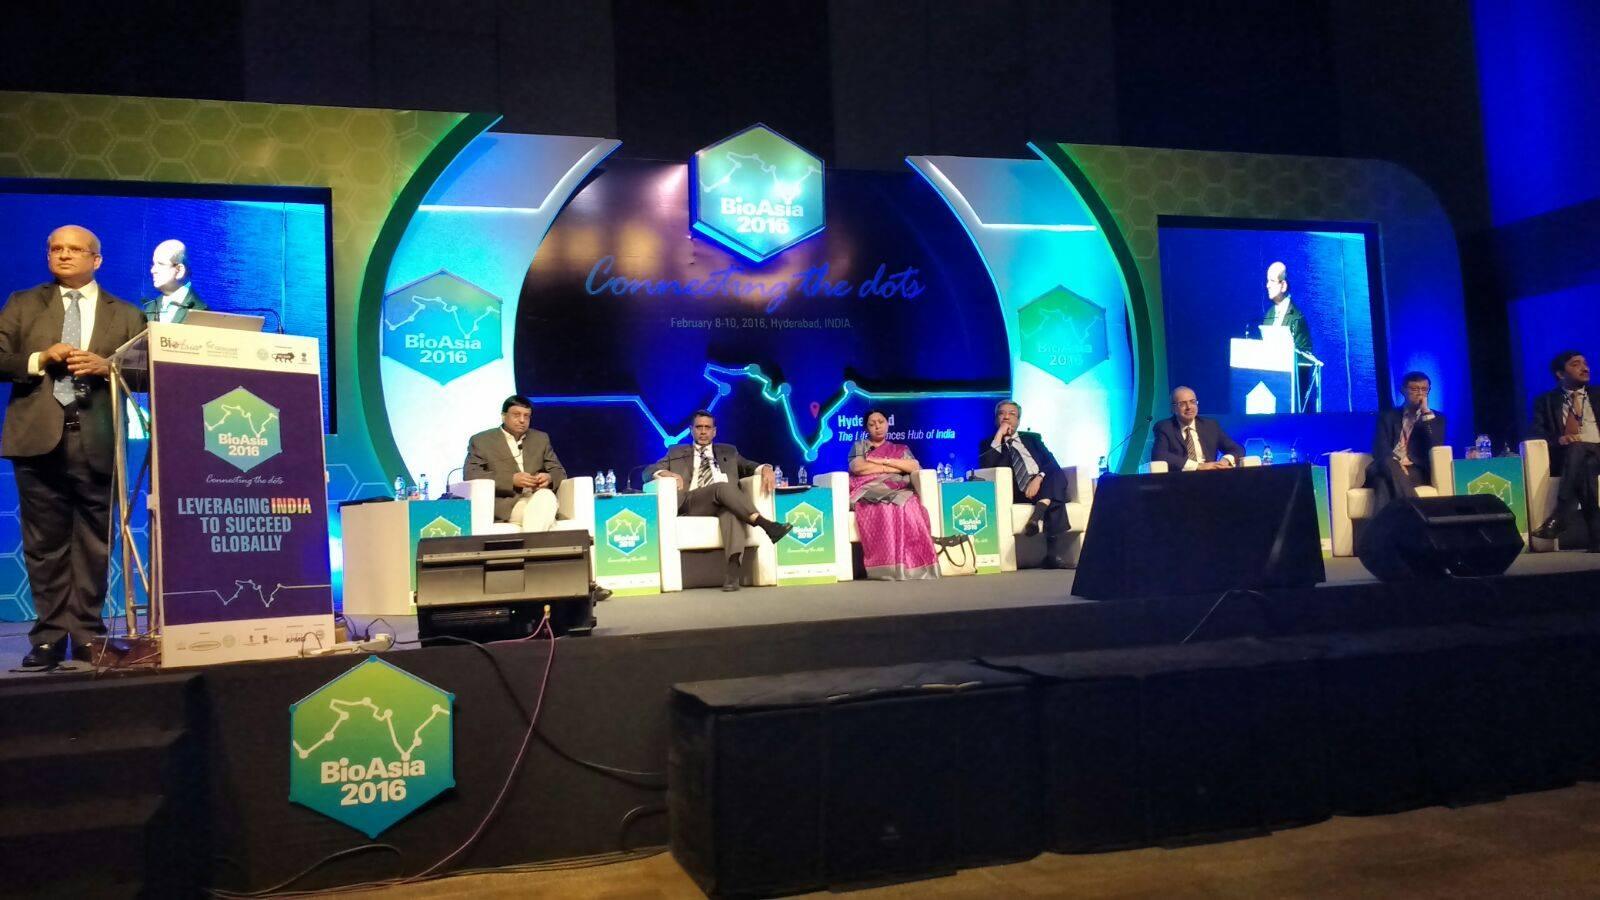 Dr Rajiv I Modi, Rajiv Modi, CMD Cadila Pharmaceuticals, KPMG, Bio Asia